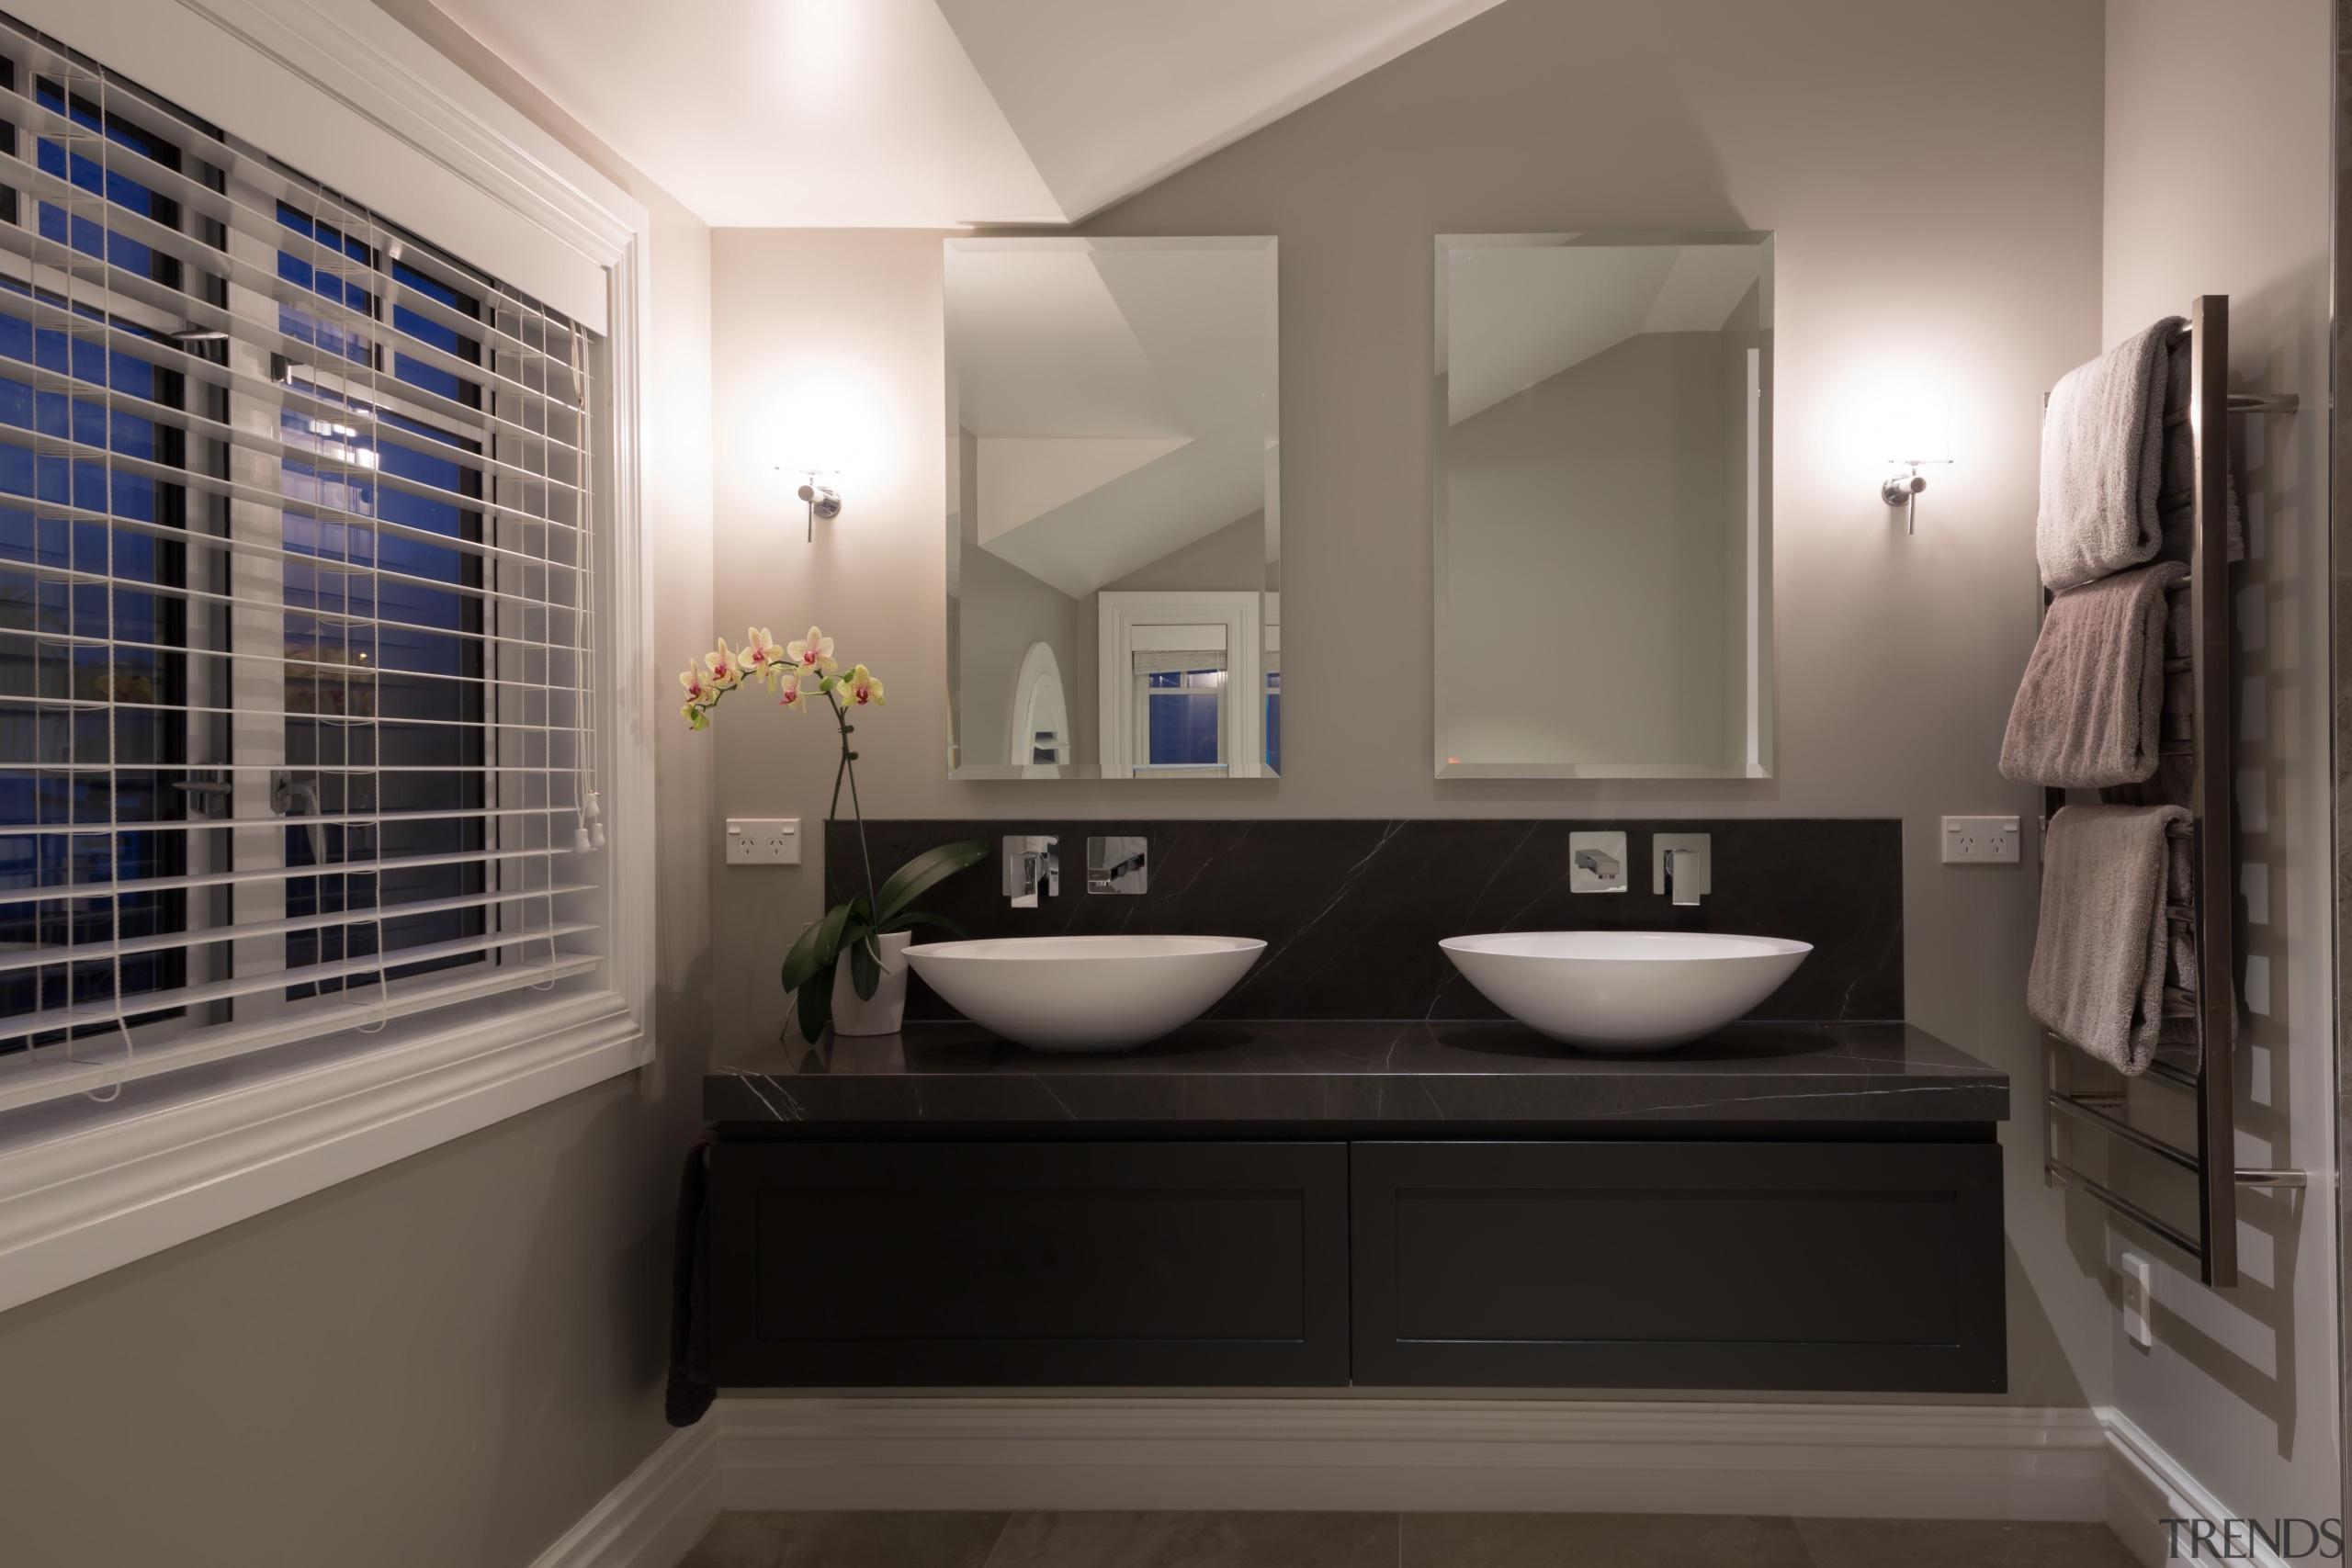 img9025.jpg - img9025.jpg - bathroom | interior design bathroom, interior design, room, gray, black